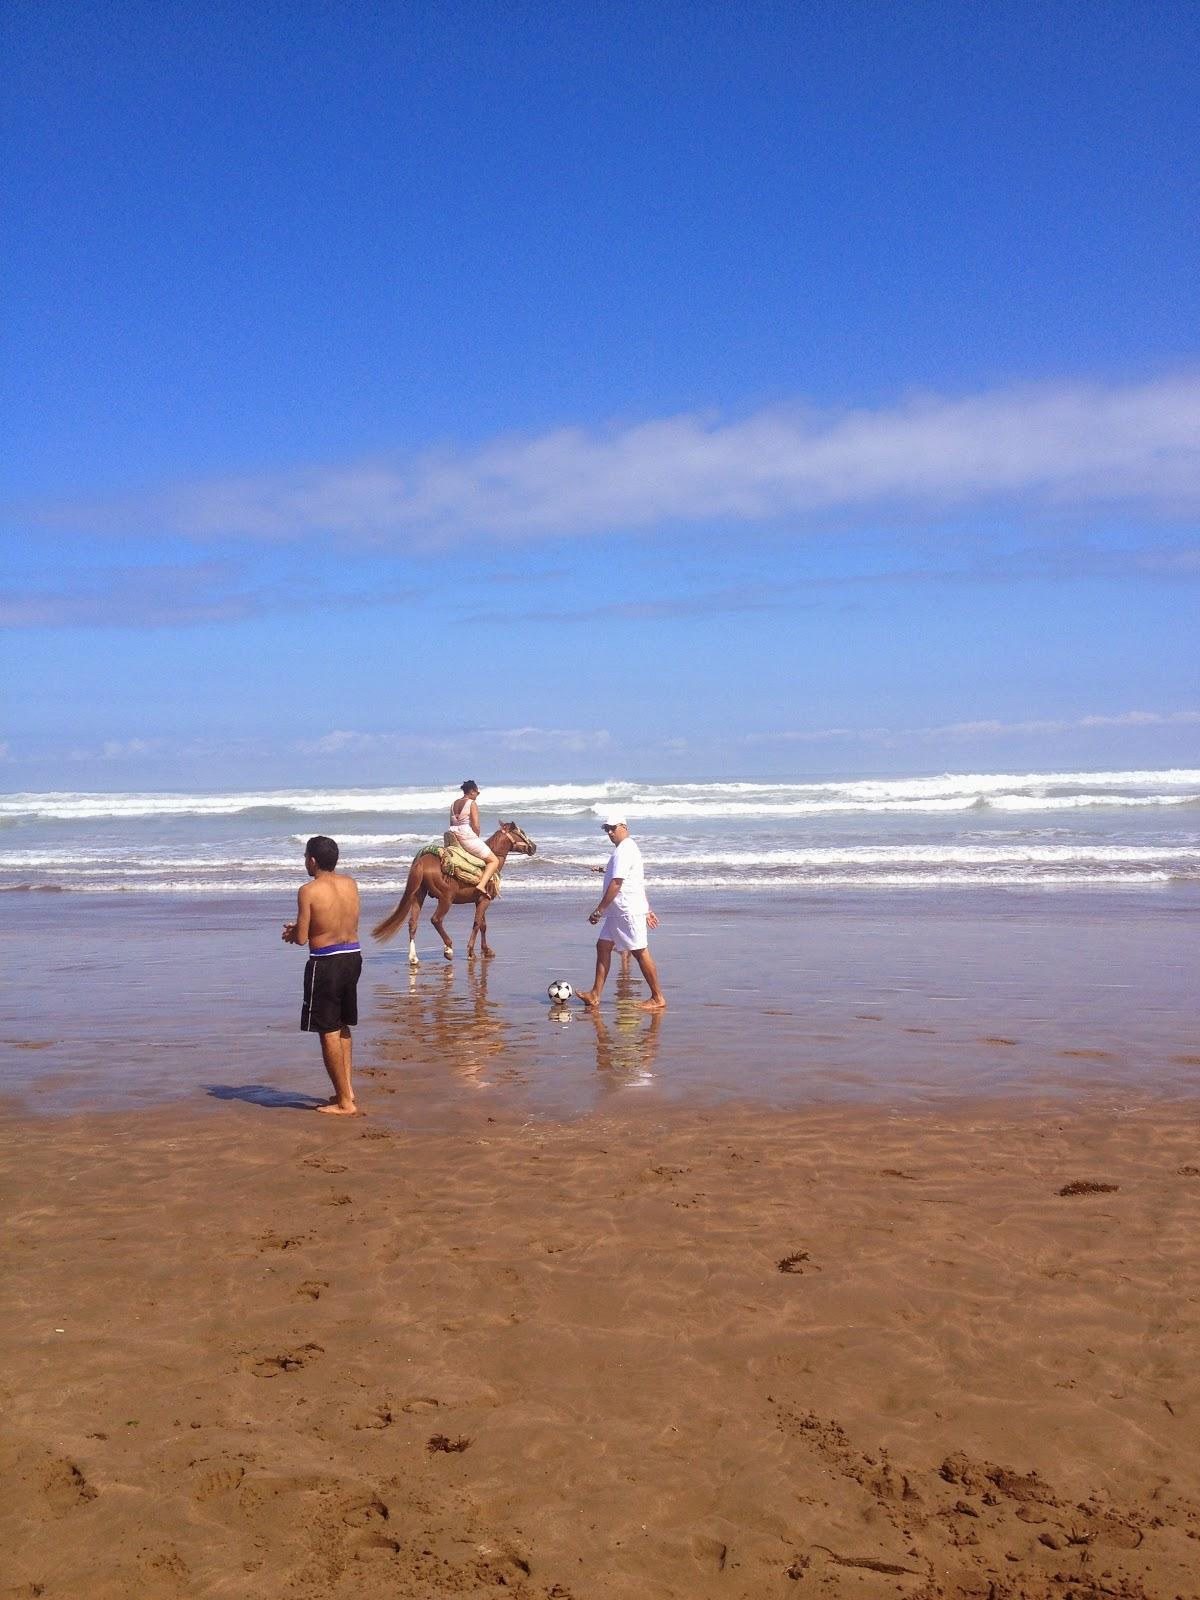 My year abroad in Melilla: Visiting Casablanca, Rabat, Marrakech and